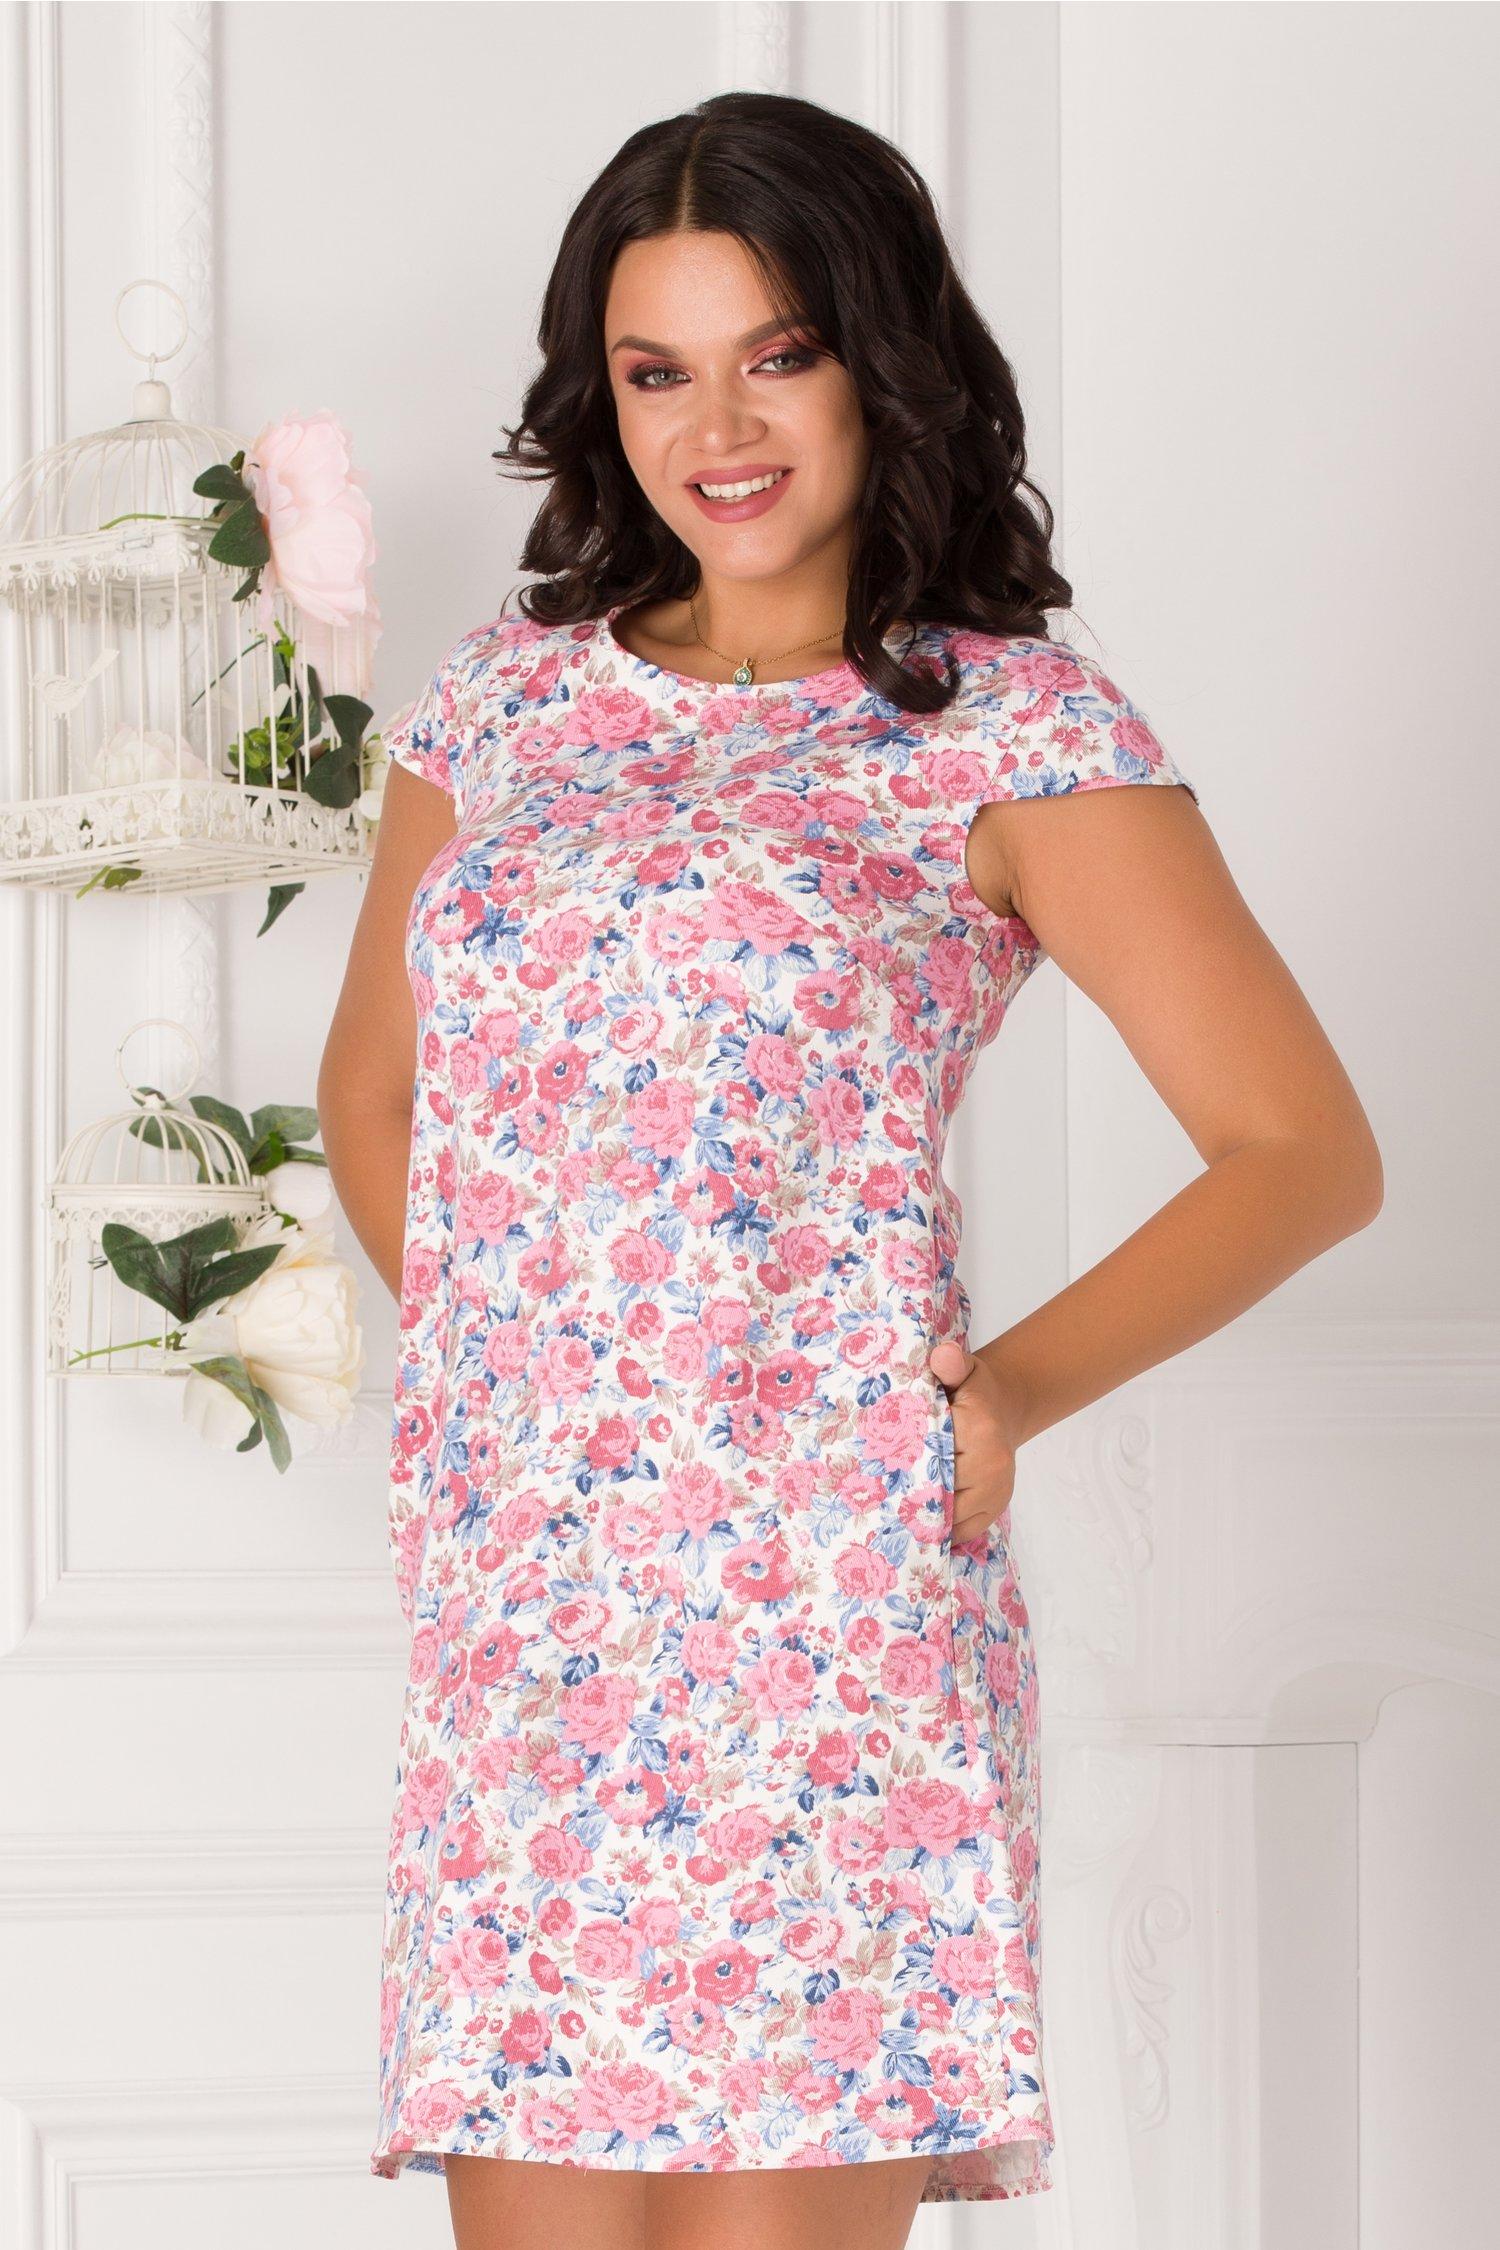 Rochie Valery alba cu imprimeu floral colorat